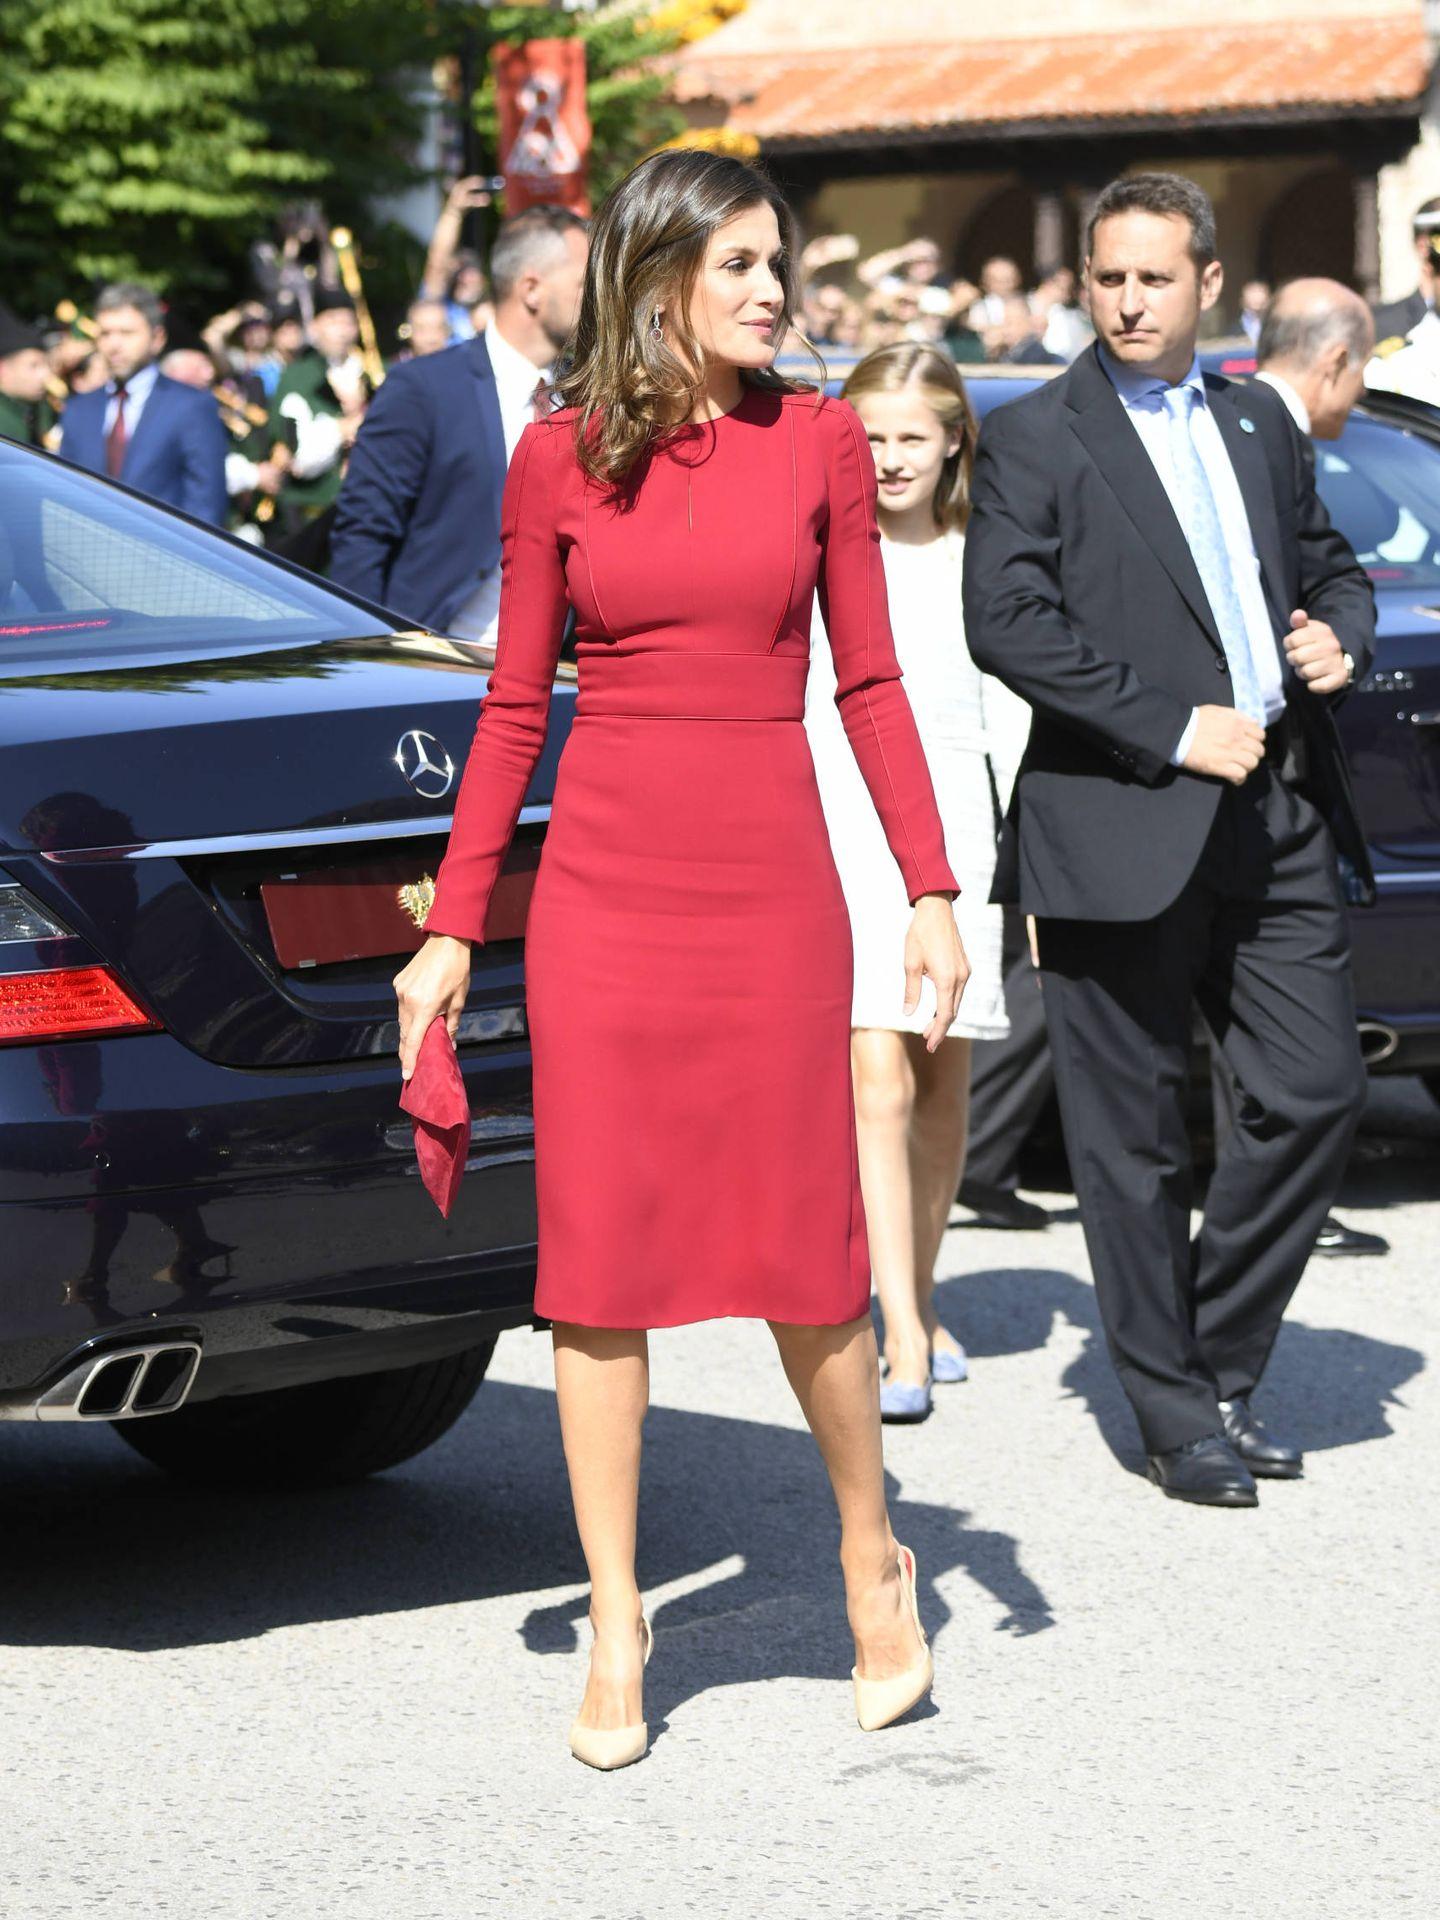 El look compelto de la Reina. (Limited Pictures)